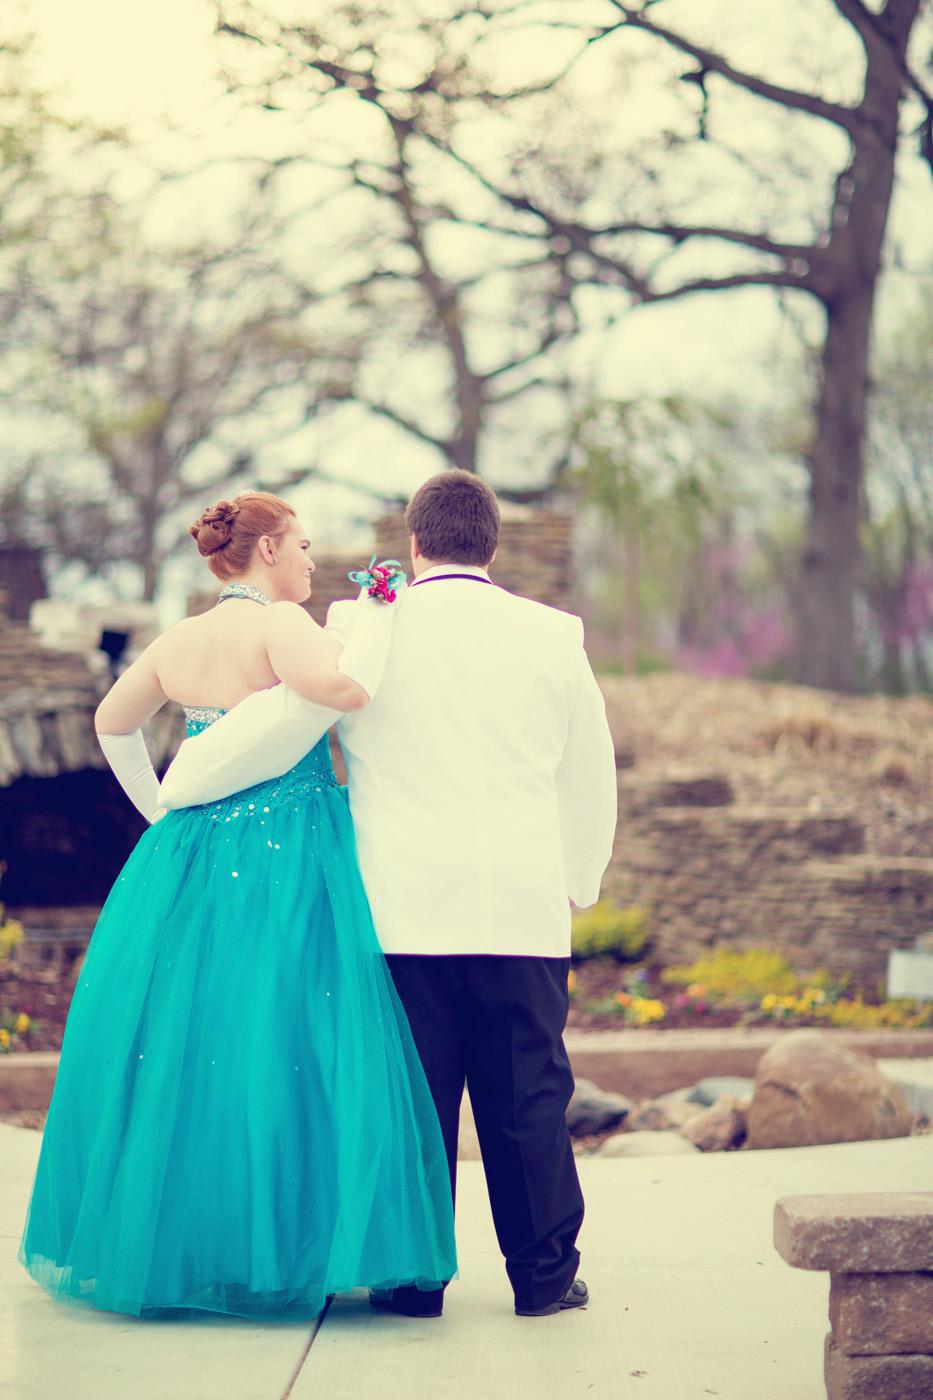 Garrett & Helen Prom 2014 235_1.jpg